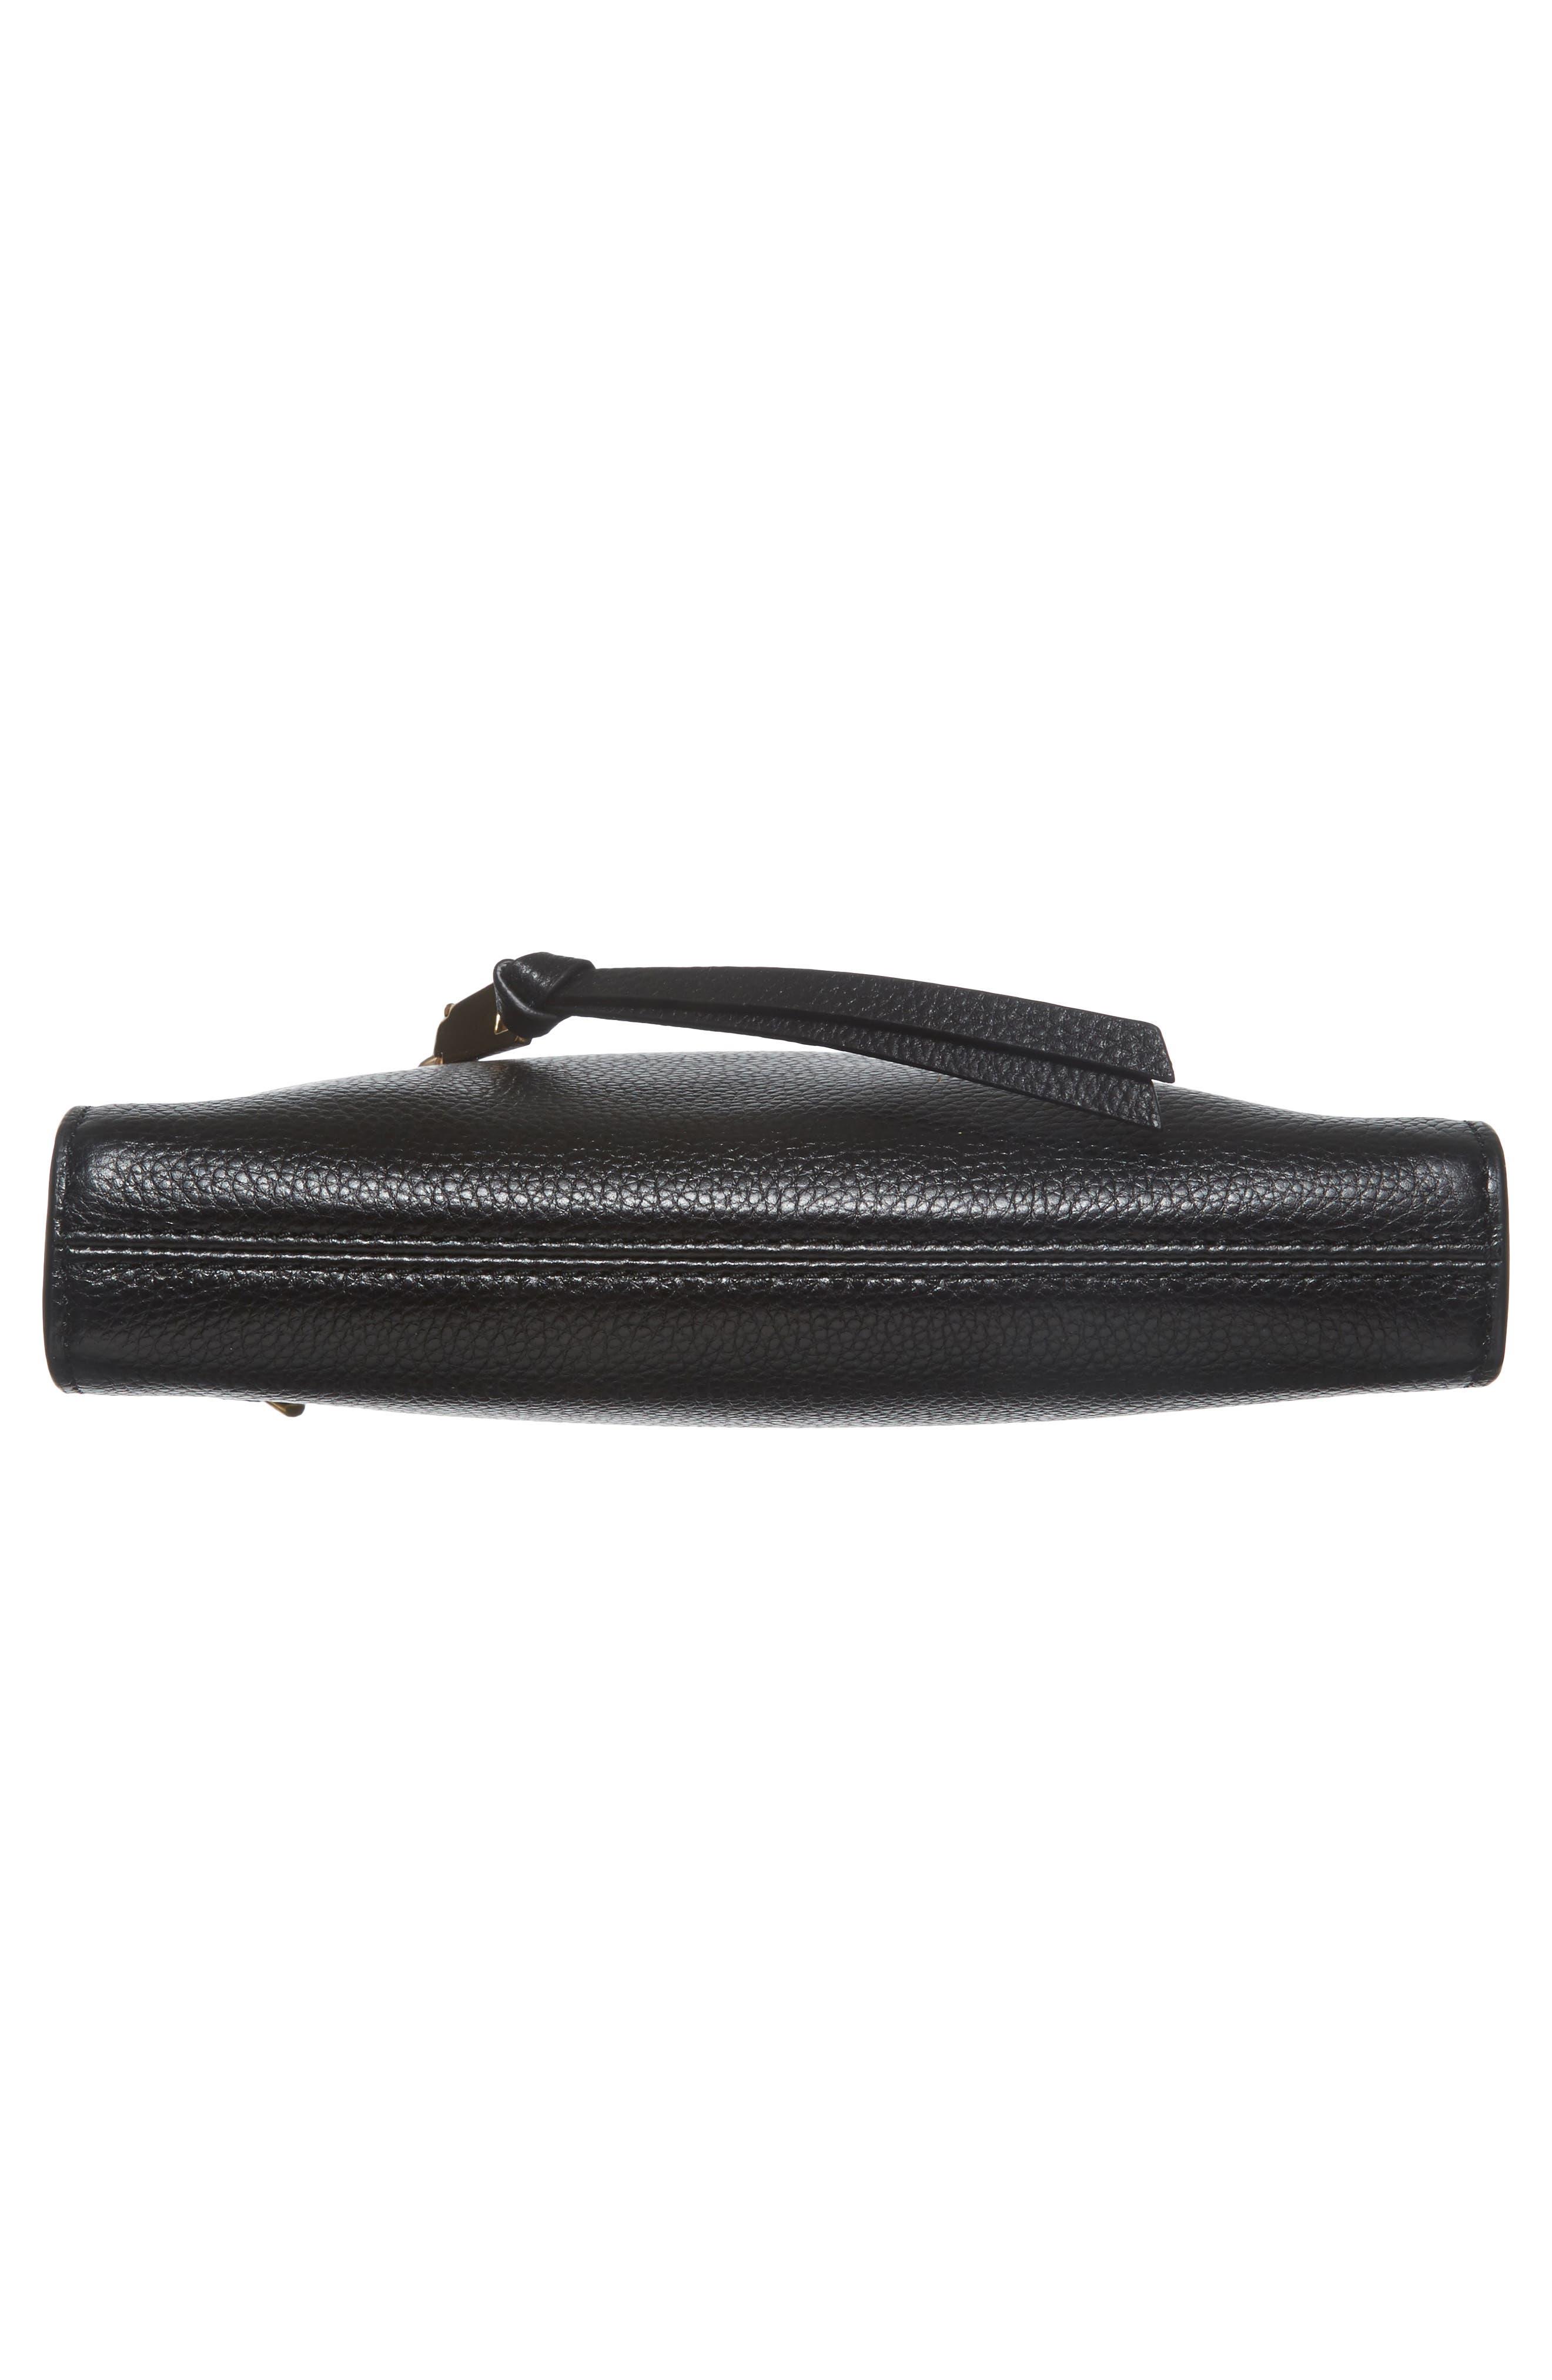 Small Recruit Leather Crossbody Bag,                             Alternate thumbnail 6, color,                             001